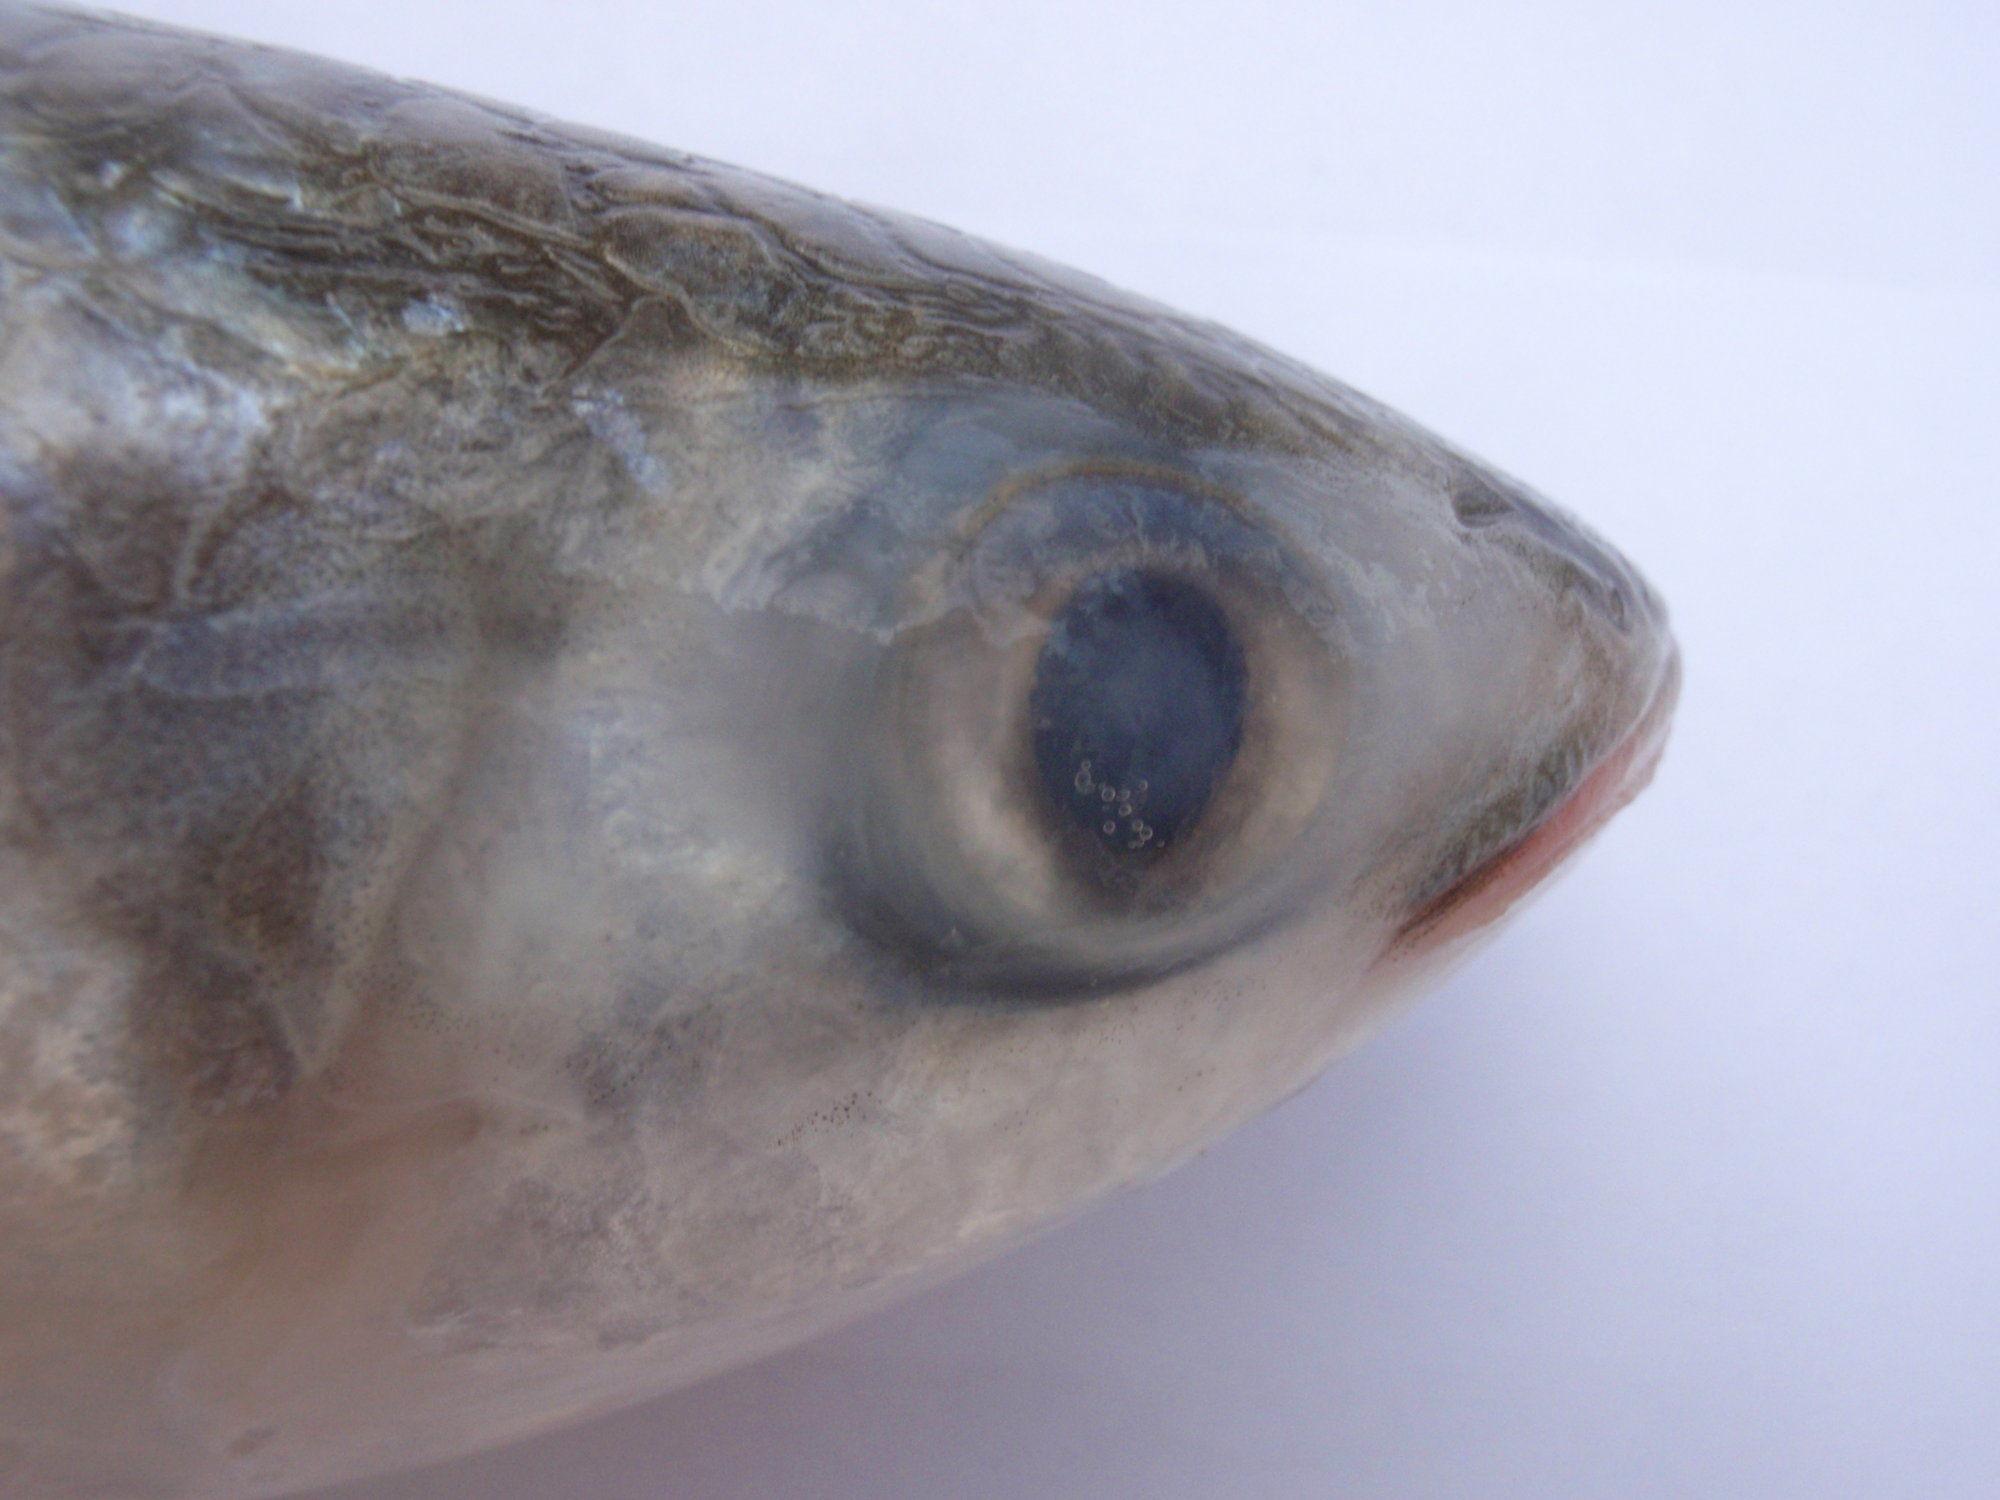 Eyelid-of-Mullet-fish